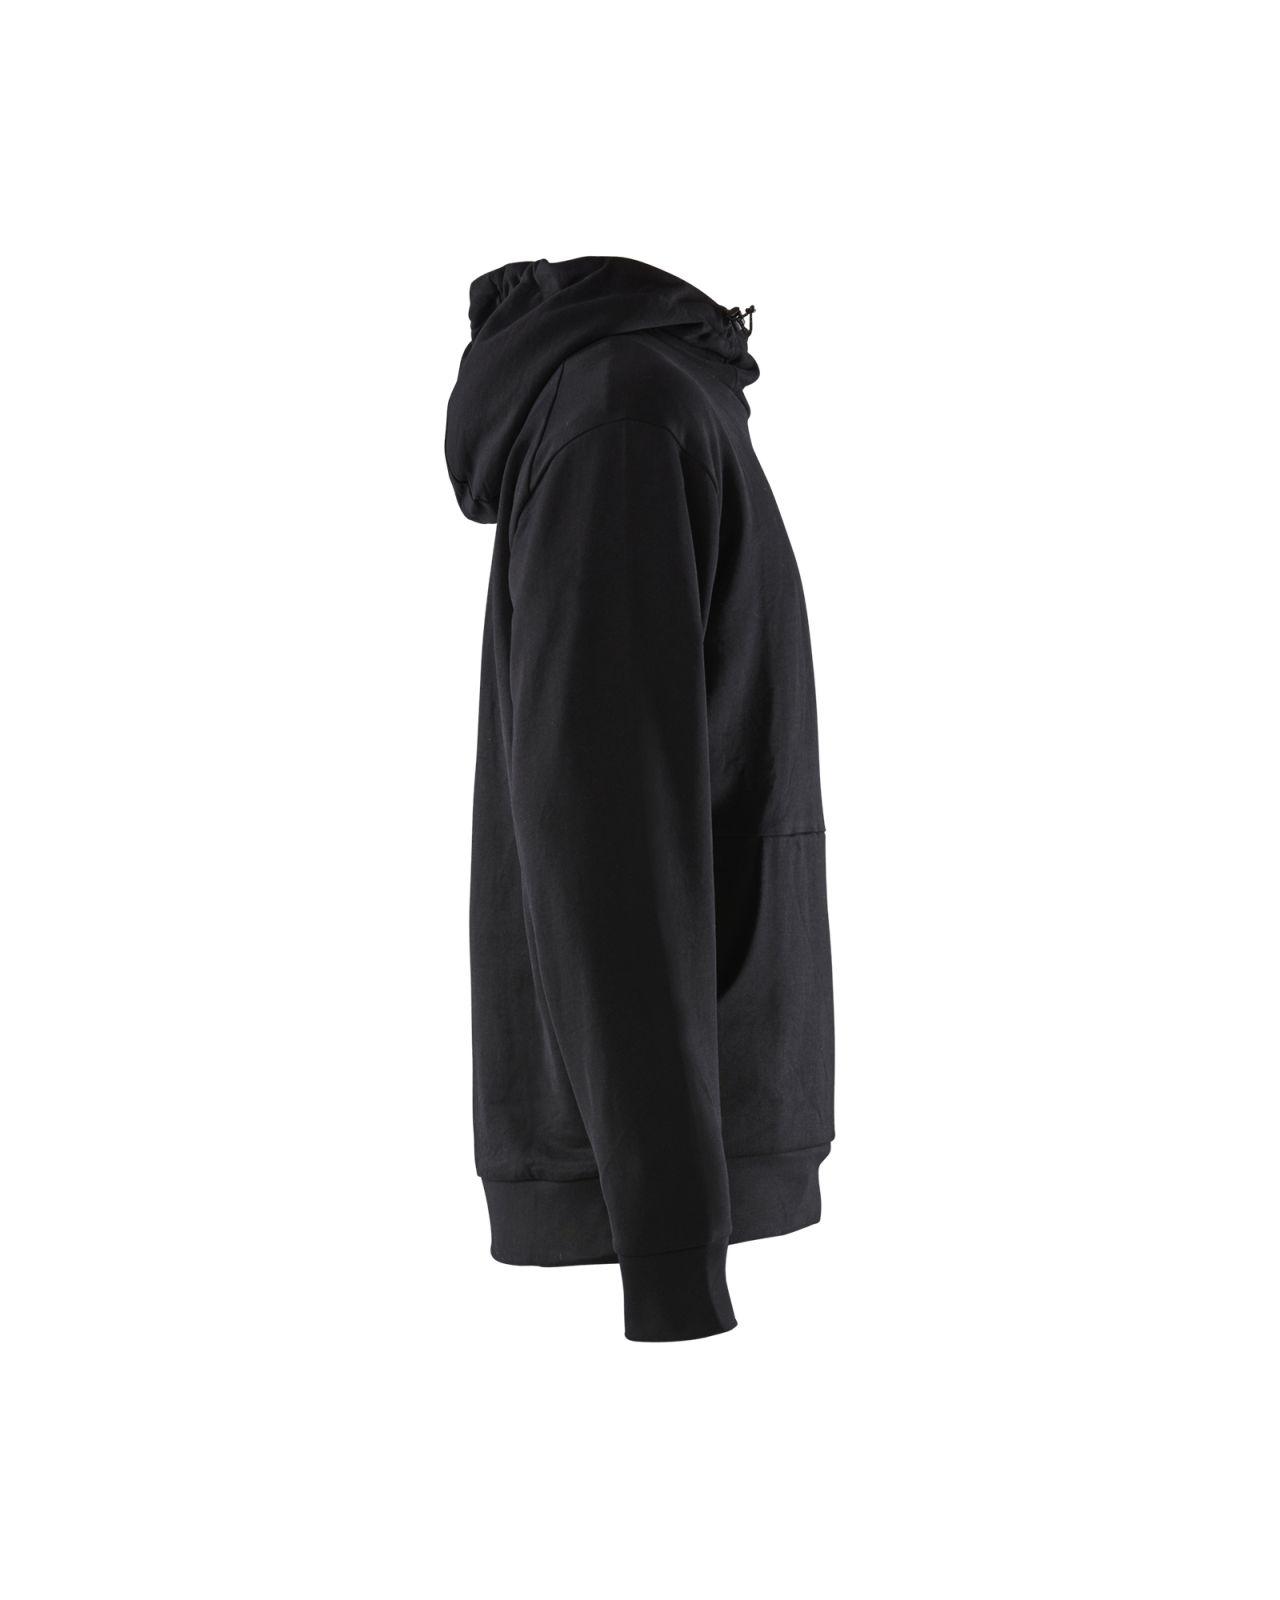 Blaklader sweatershirts 34301158 zwart(9900)